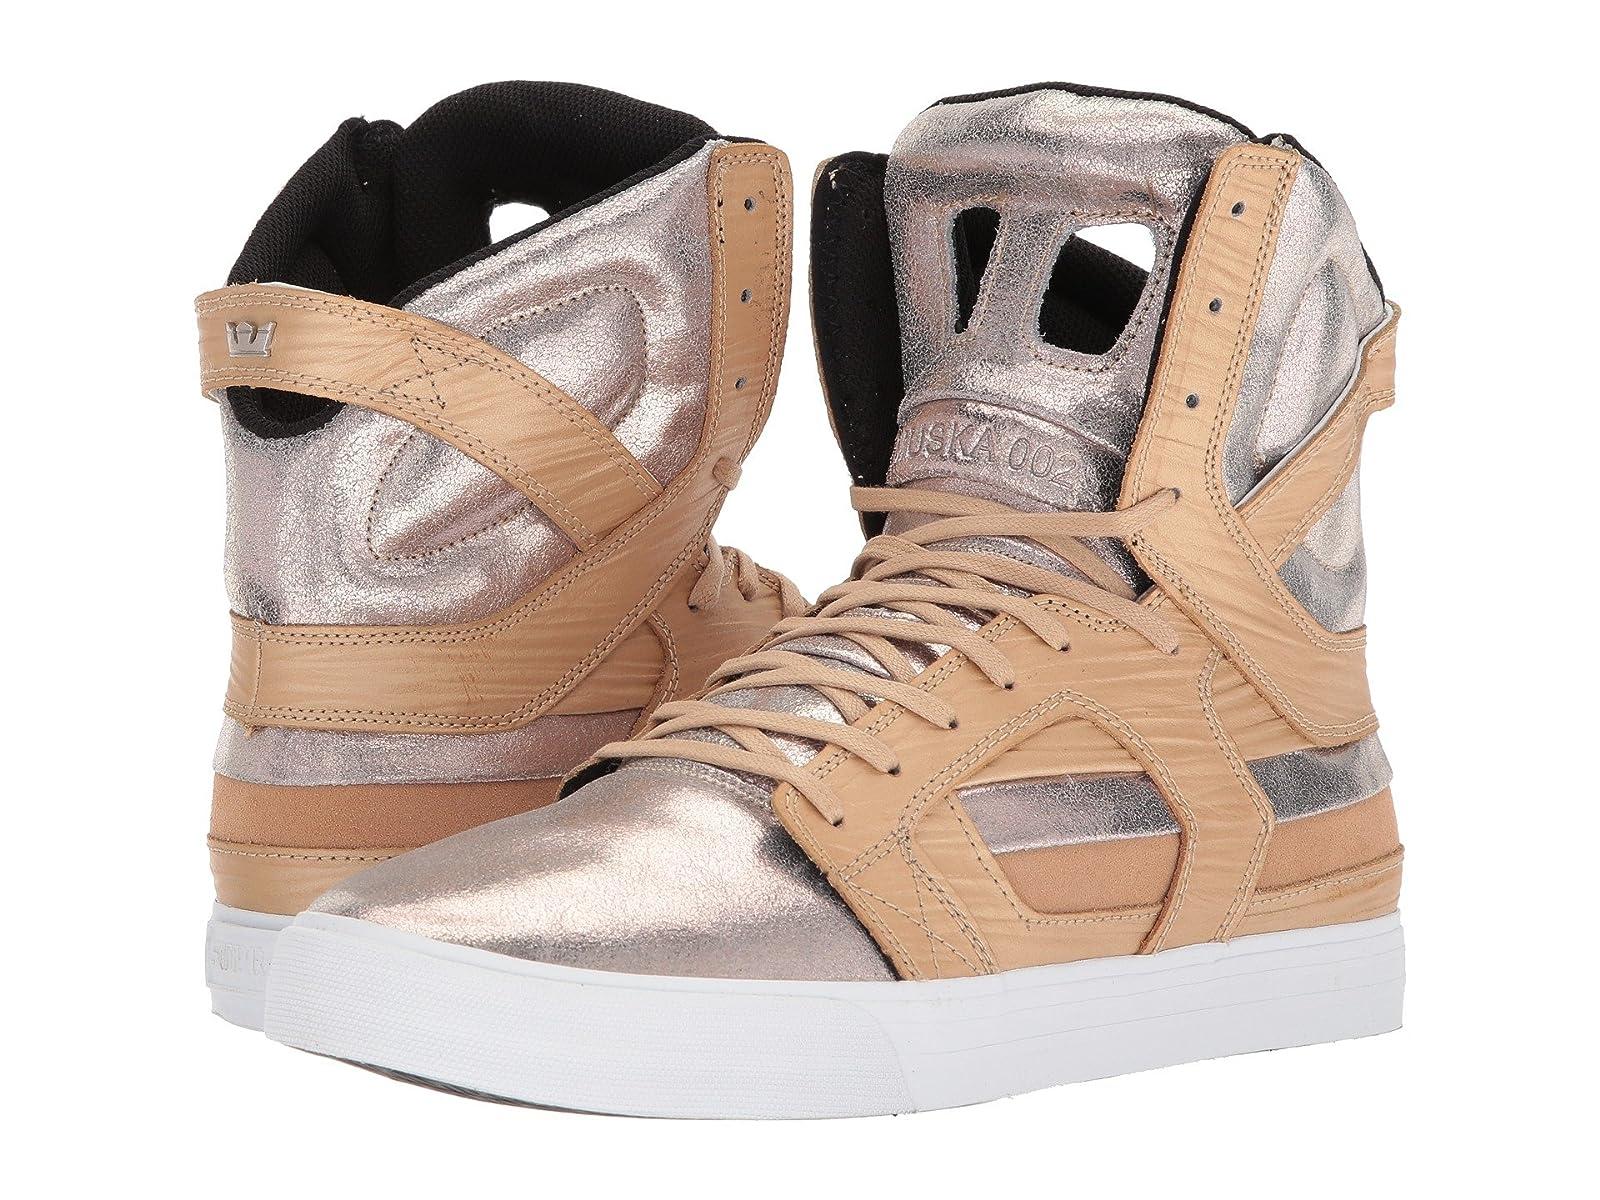 Supra Skytop IIAtmospheric grades have affordable shoes